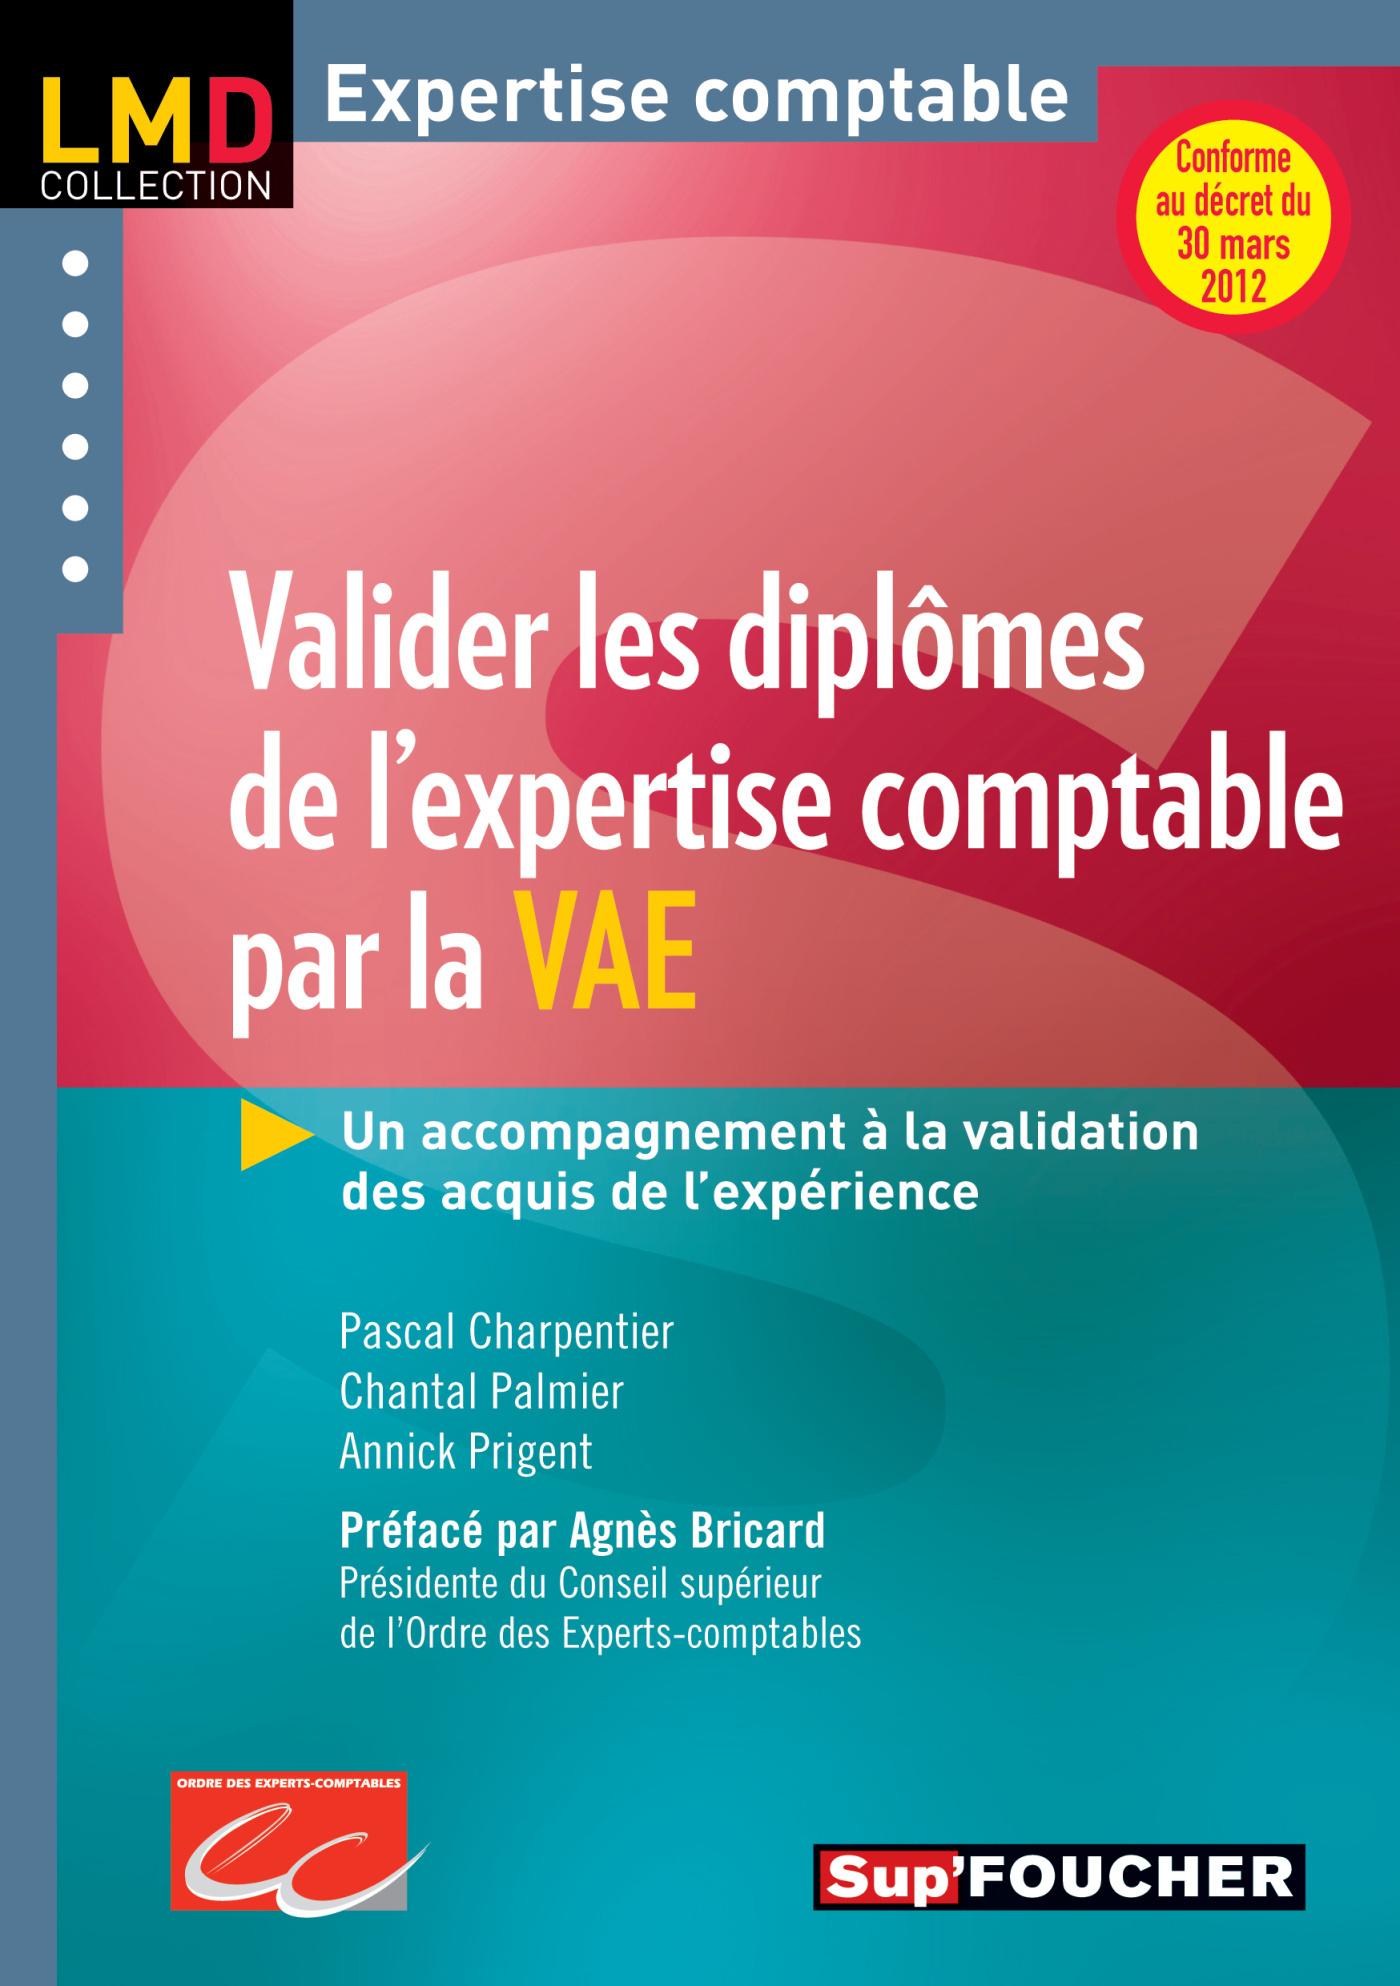 VALIDER LES DIPLOMES DE L'EXPERTISE COMPTABLE PAR LA V.A.E. N.E